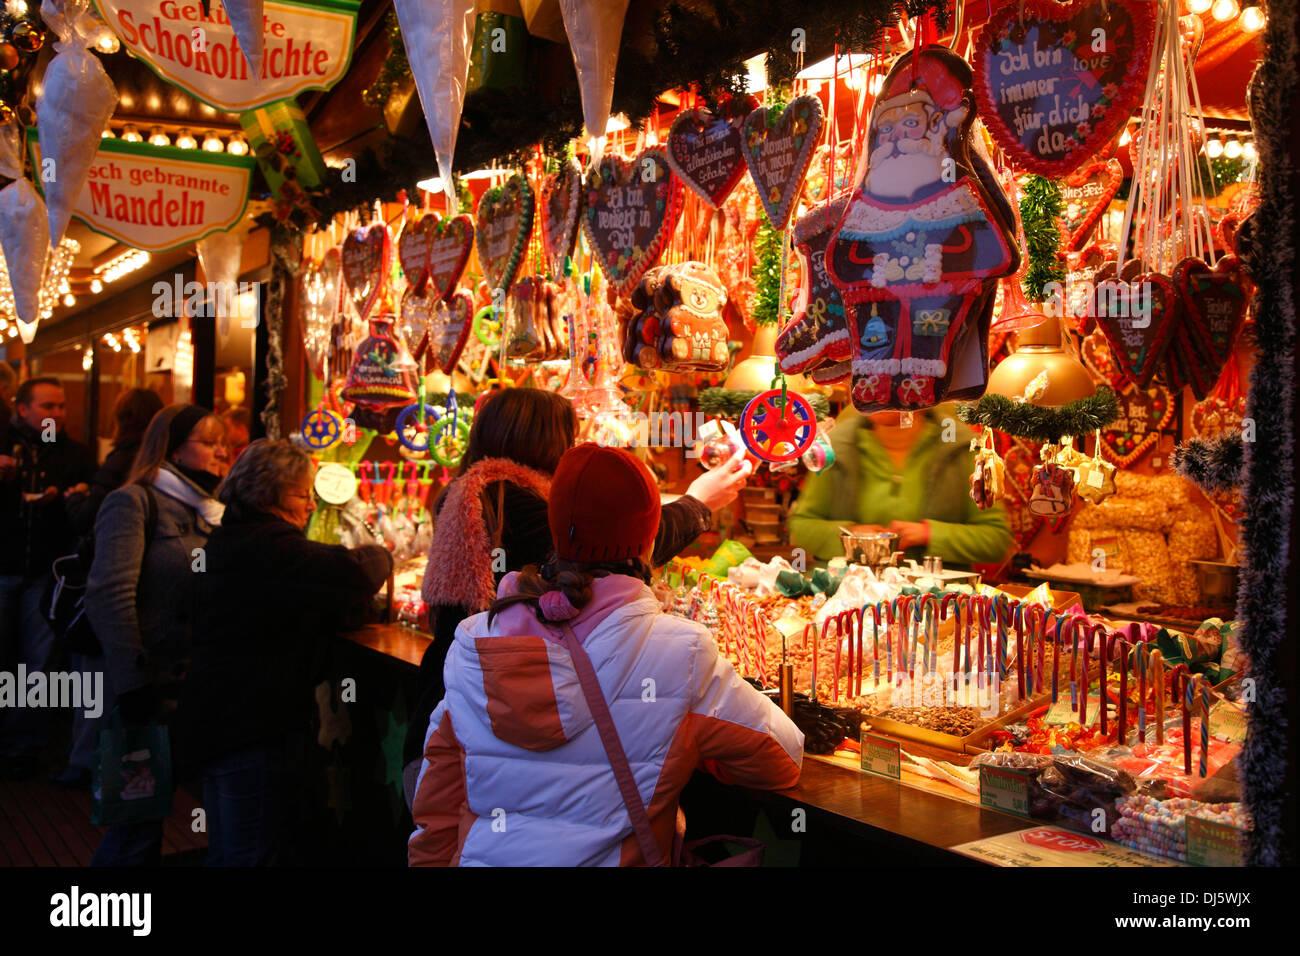 Stall at Christmas market, market Place, Lueneburg,  Lüneburg, Lower Saxony, Germany - Stock Image